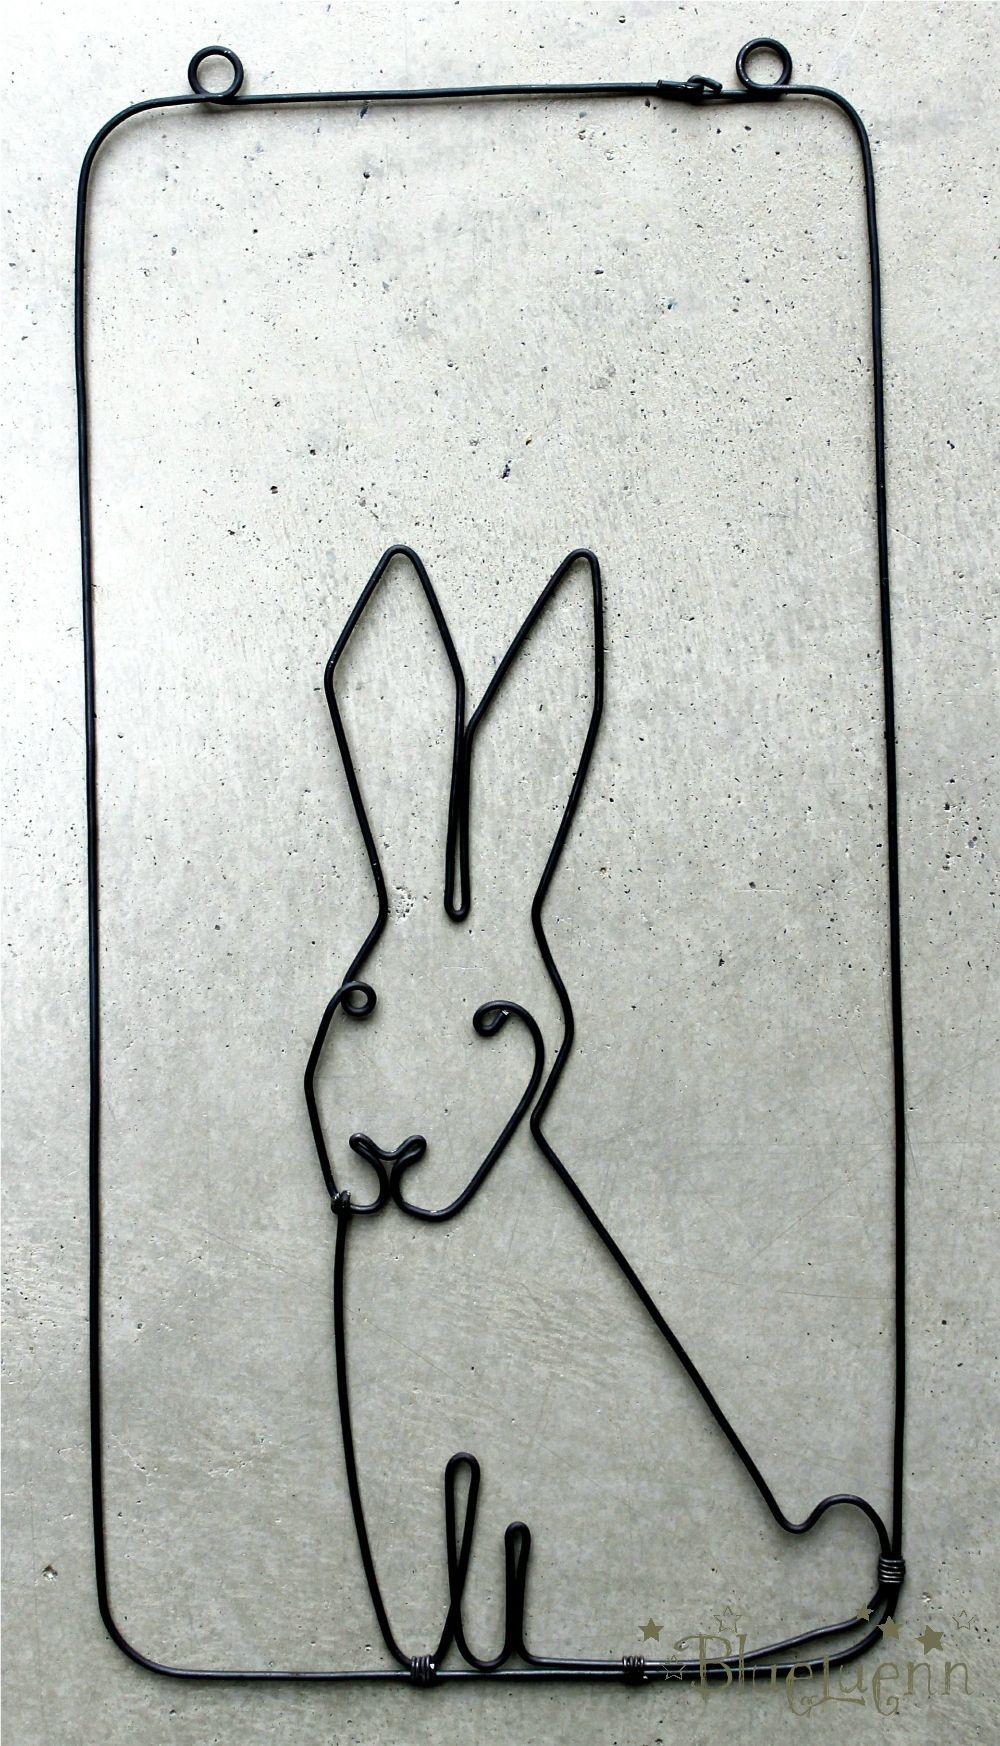 Großzügig Maschendraht Kunst Bilder - Schaltplan Serie Circuit ...